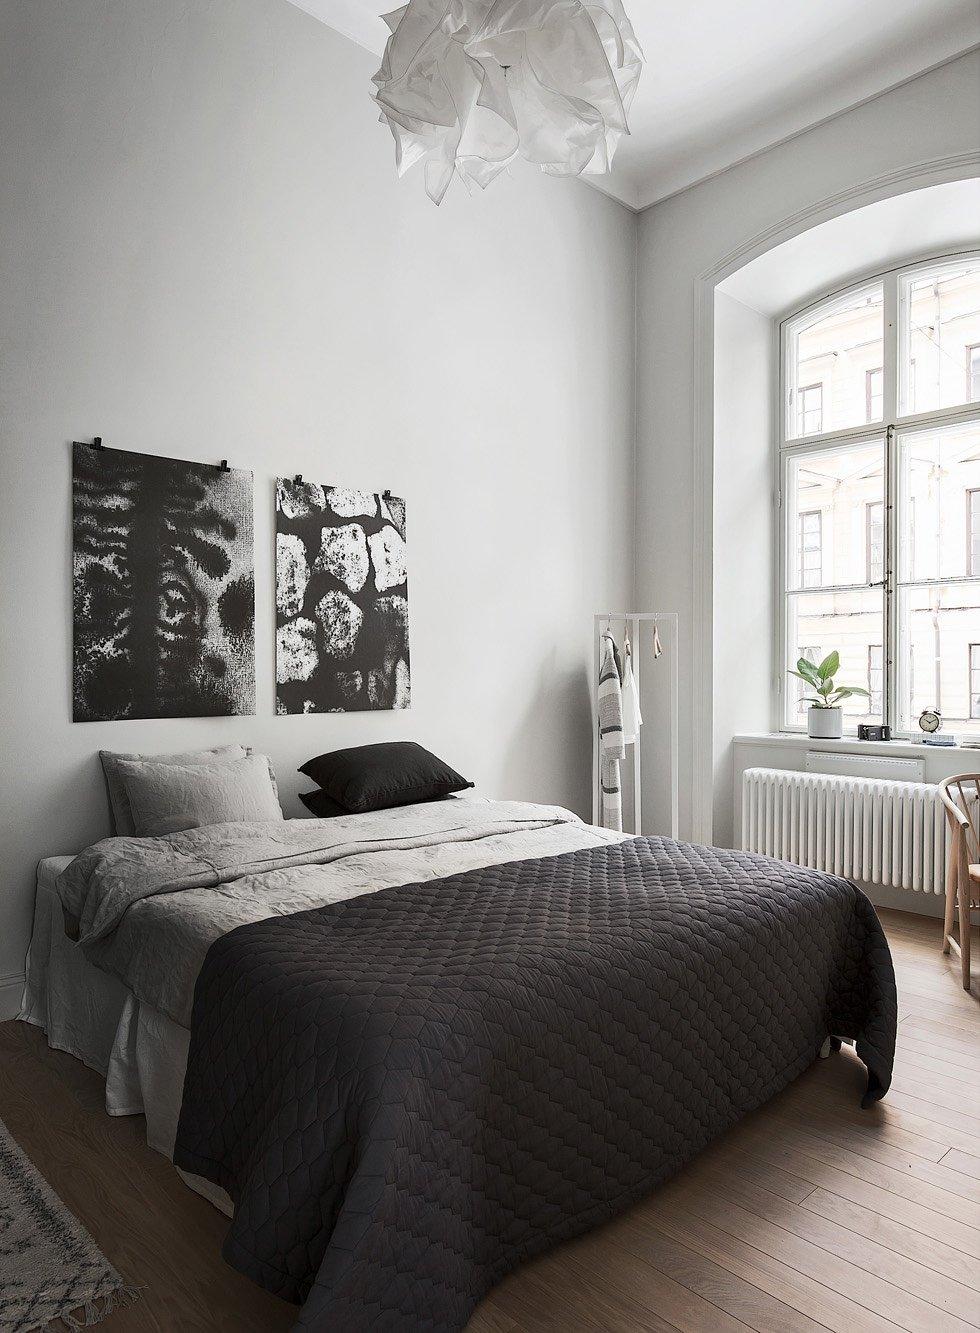 40 Minimalist Bedroom Ideas | Less is More | Homelovr on Bedroom Minimalist Ideas  id=26398